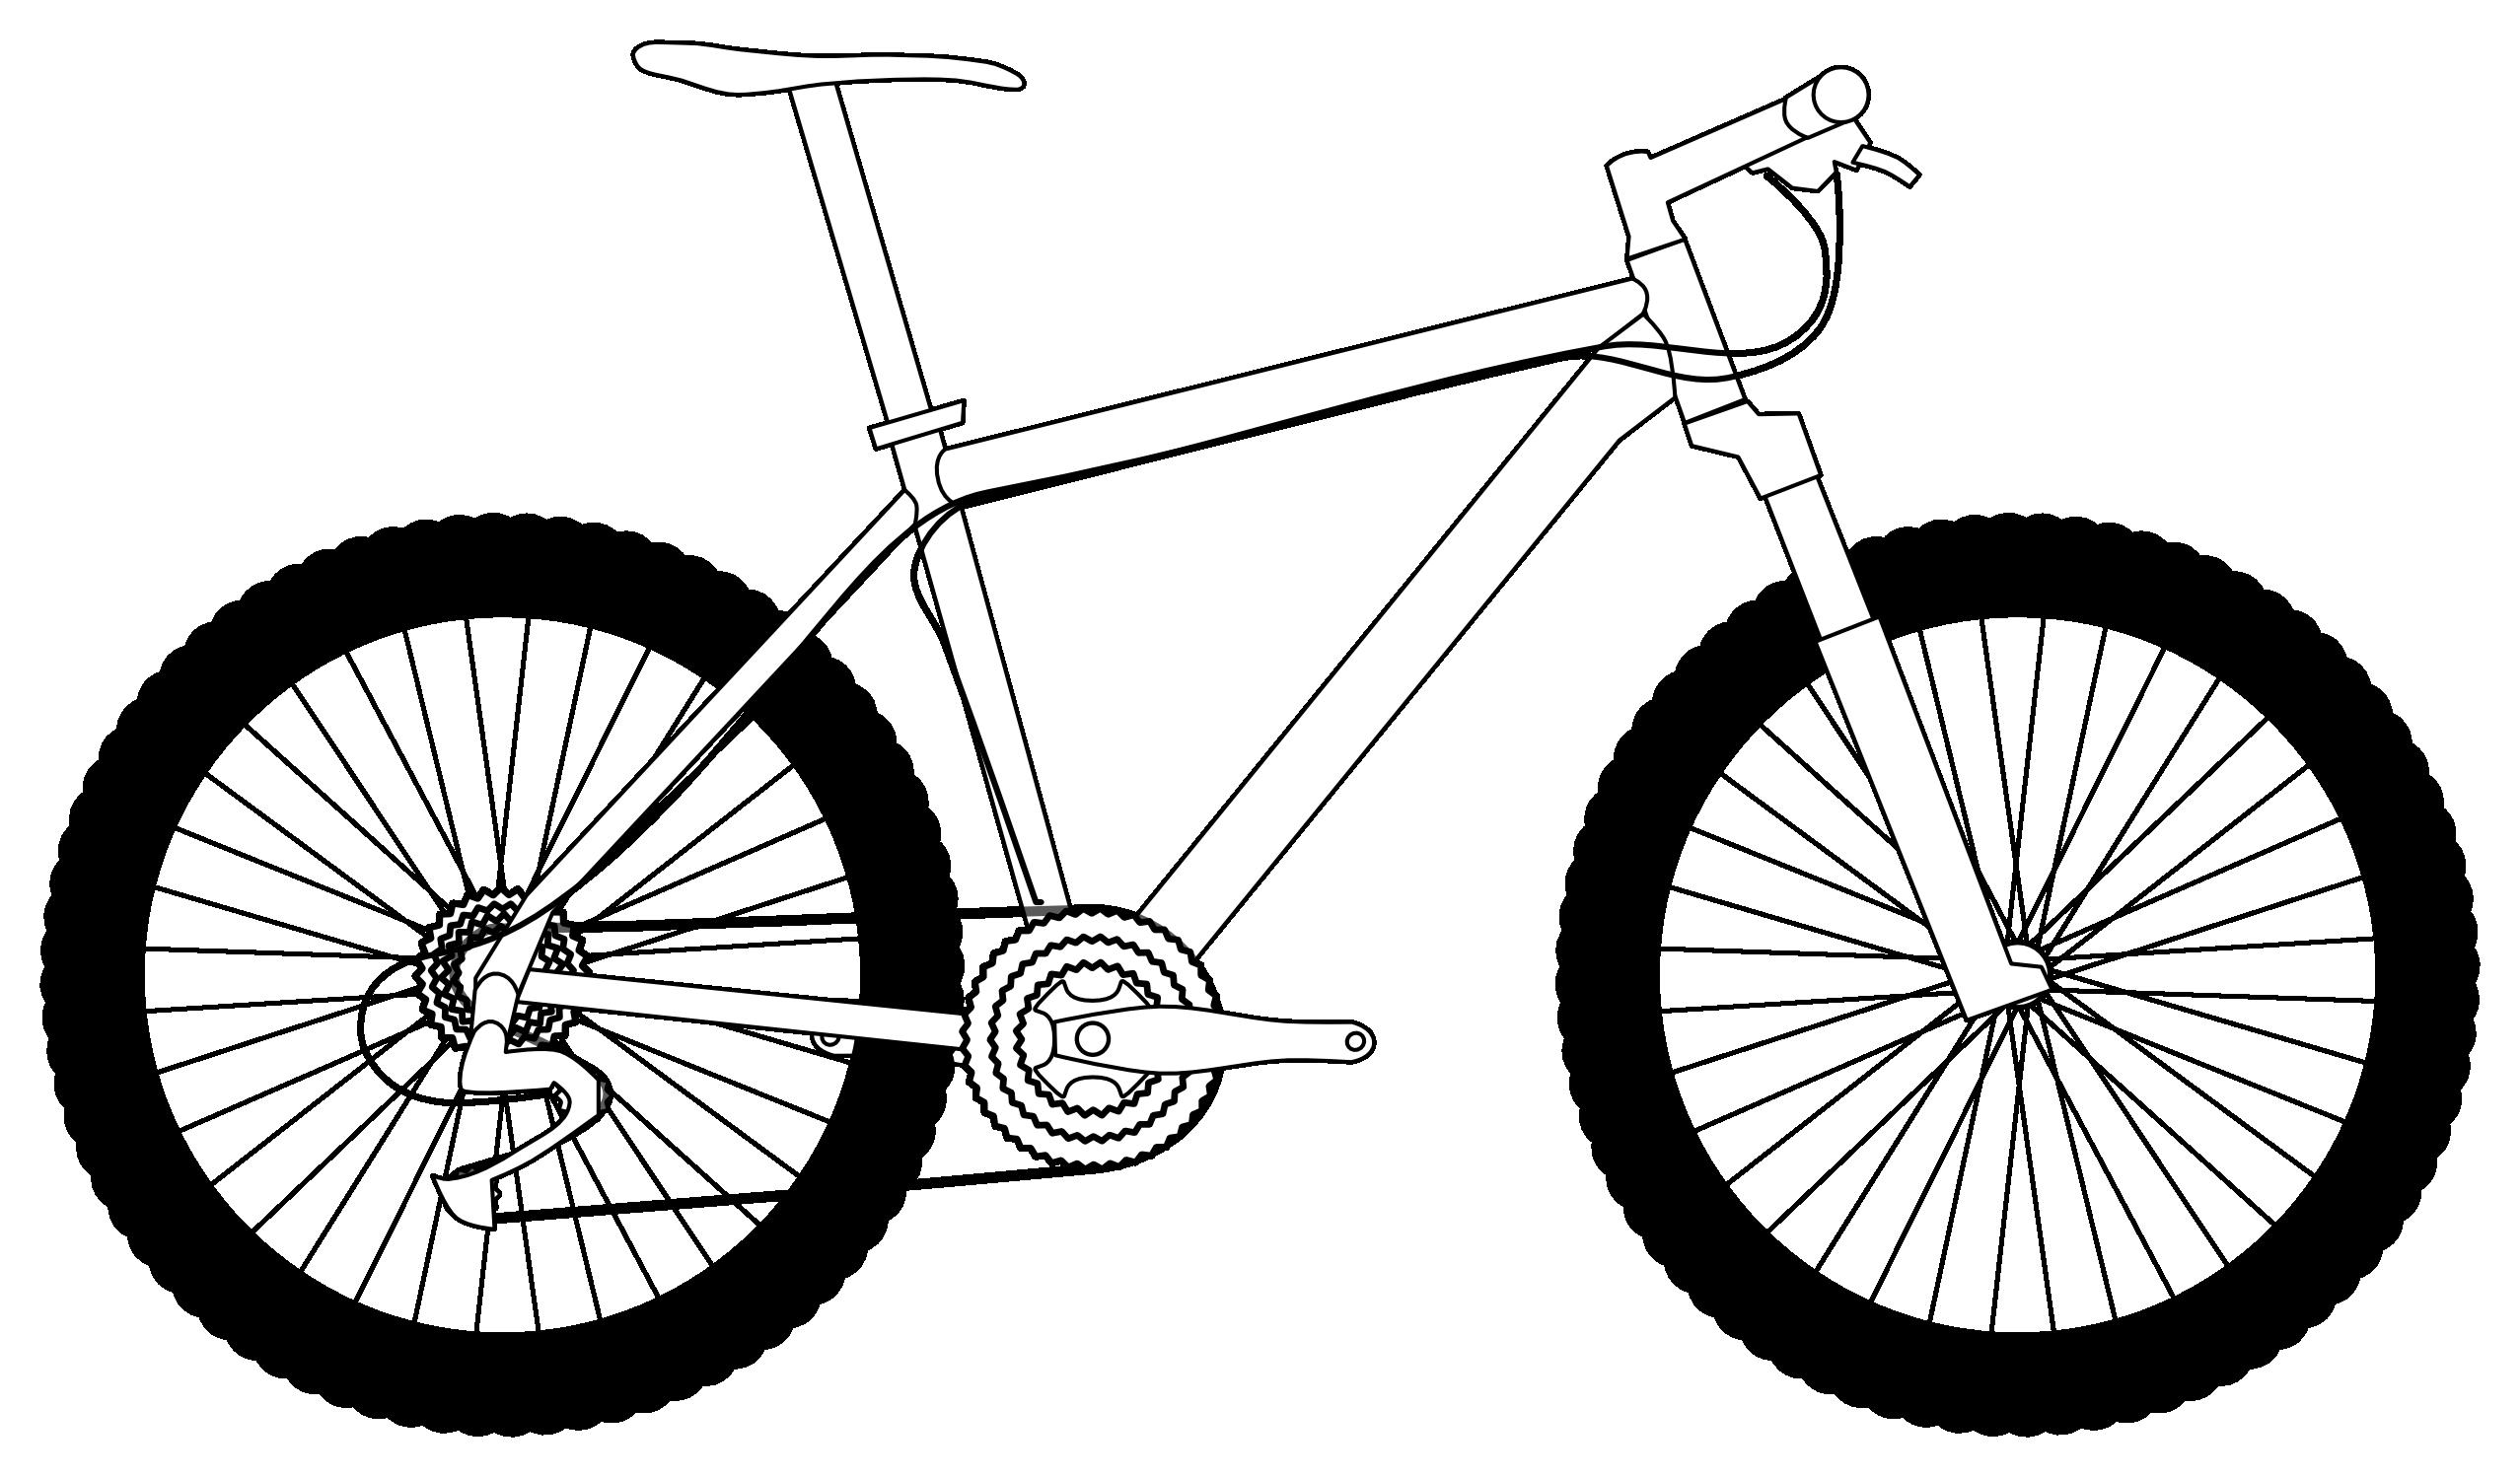 Biker clipart cycle Bicycle Clip Free sudahnyepam Art